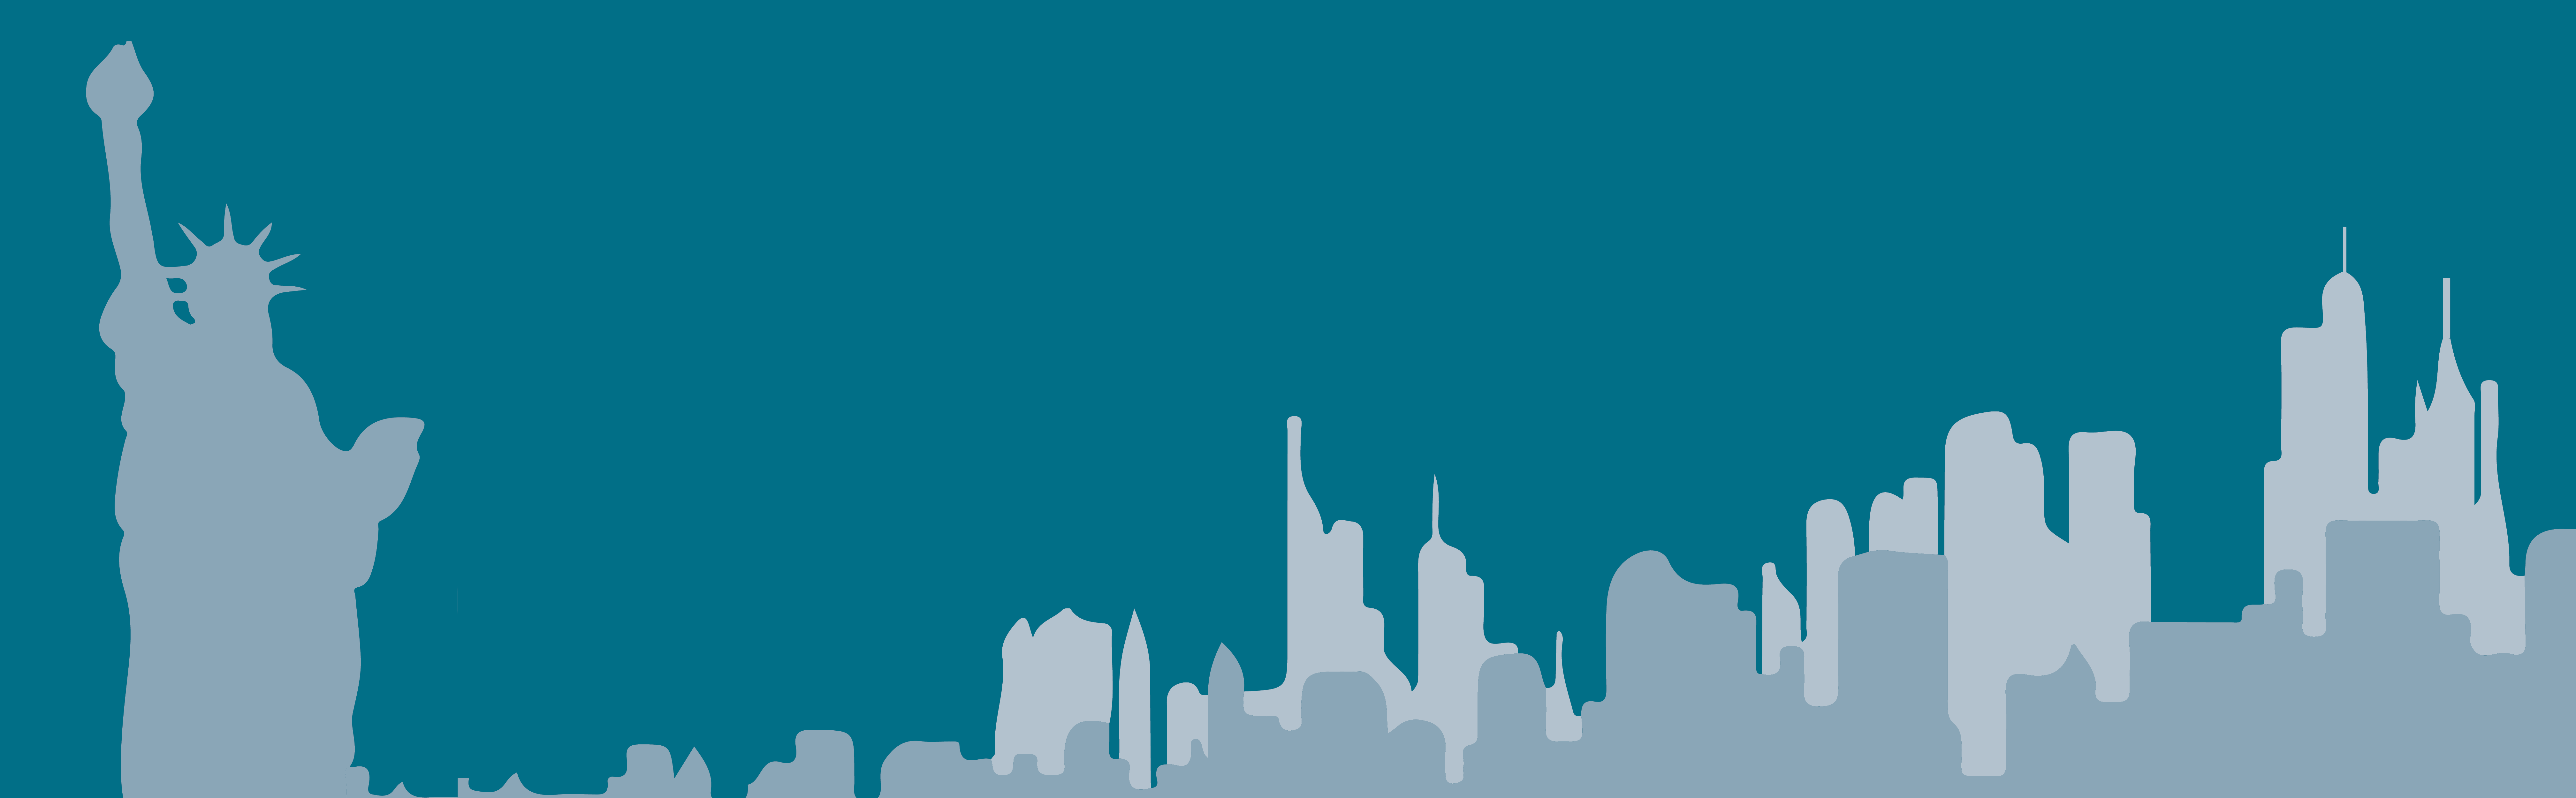 U.S. Nonprofit Compliance and Risk Management Resources - cityscape header graphic